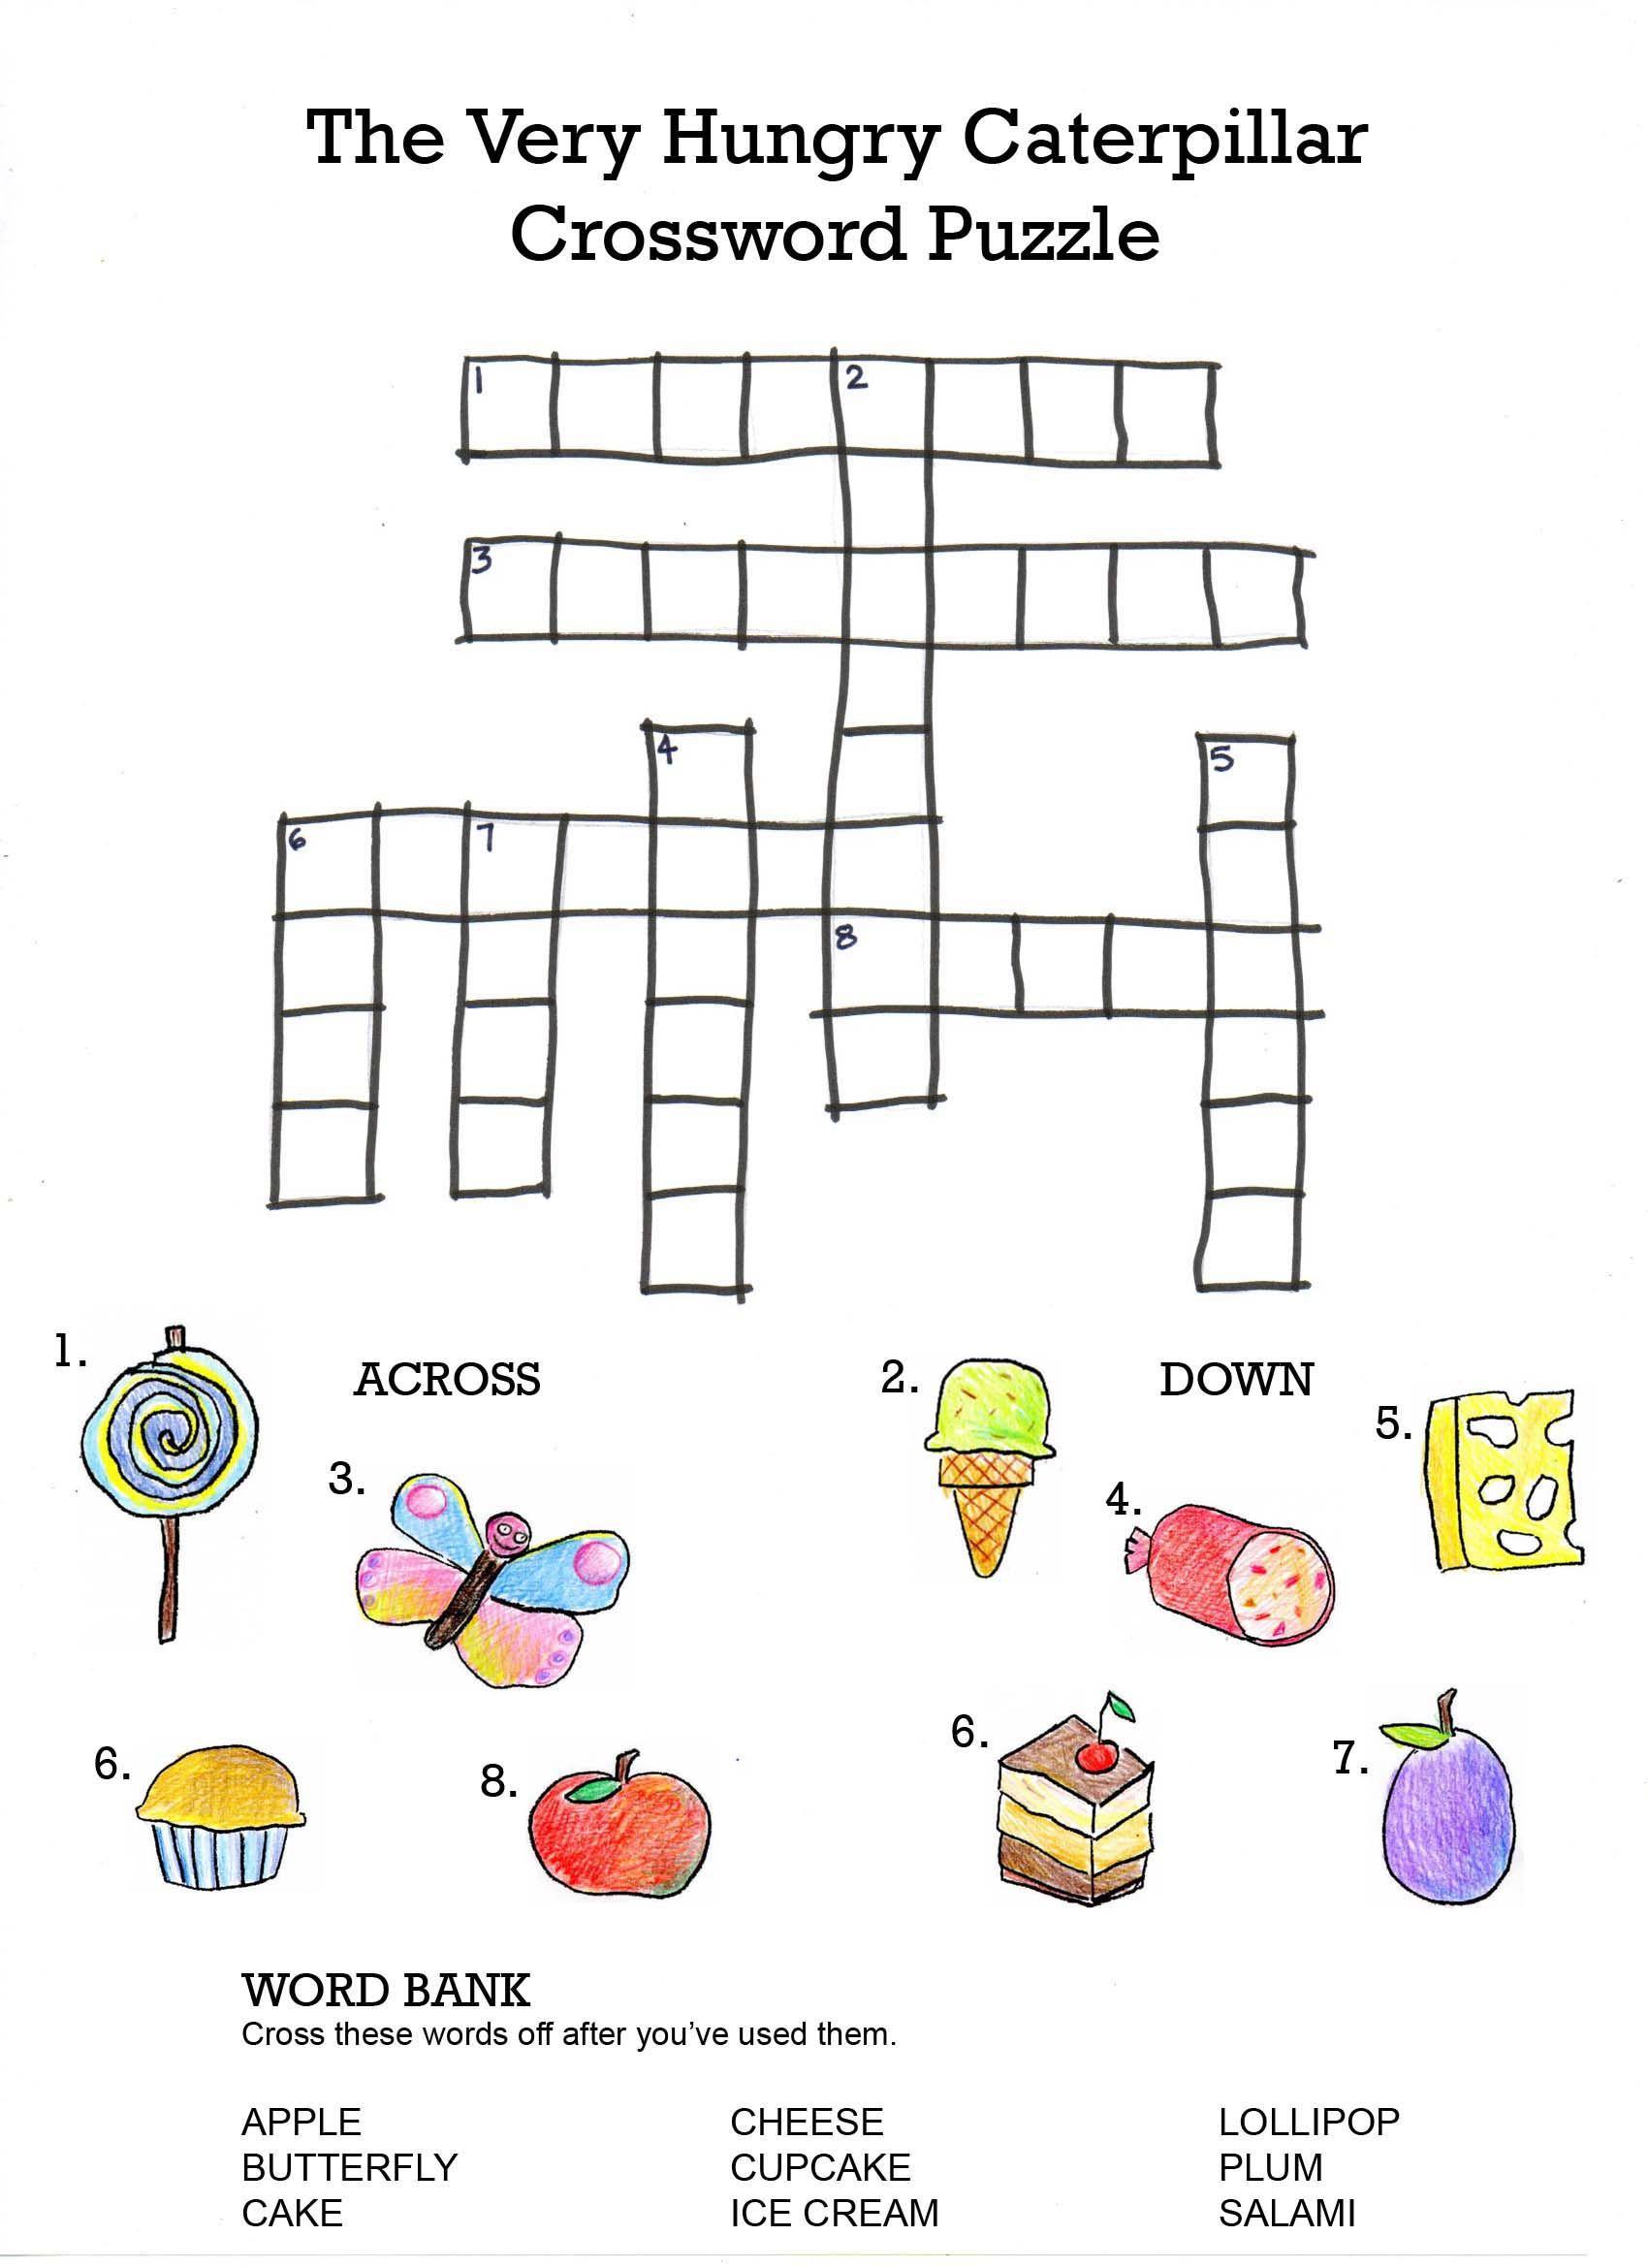 The Very Hungry Caterpillar Crossword Crossword Crossword Puzzles Puzzles For Kids [ 2339 x 1700 Pixel ]